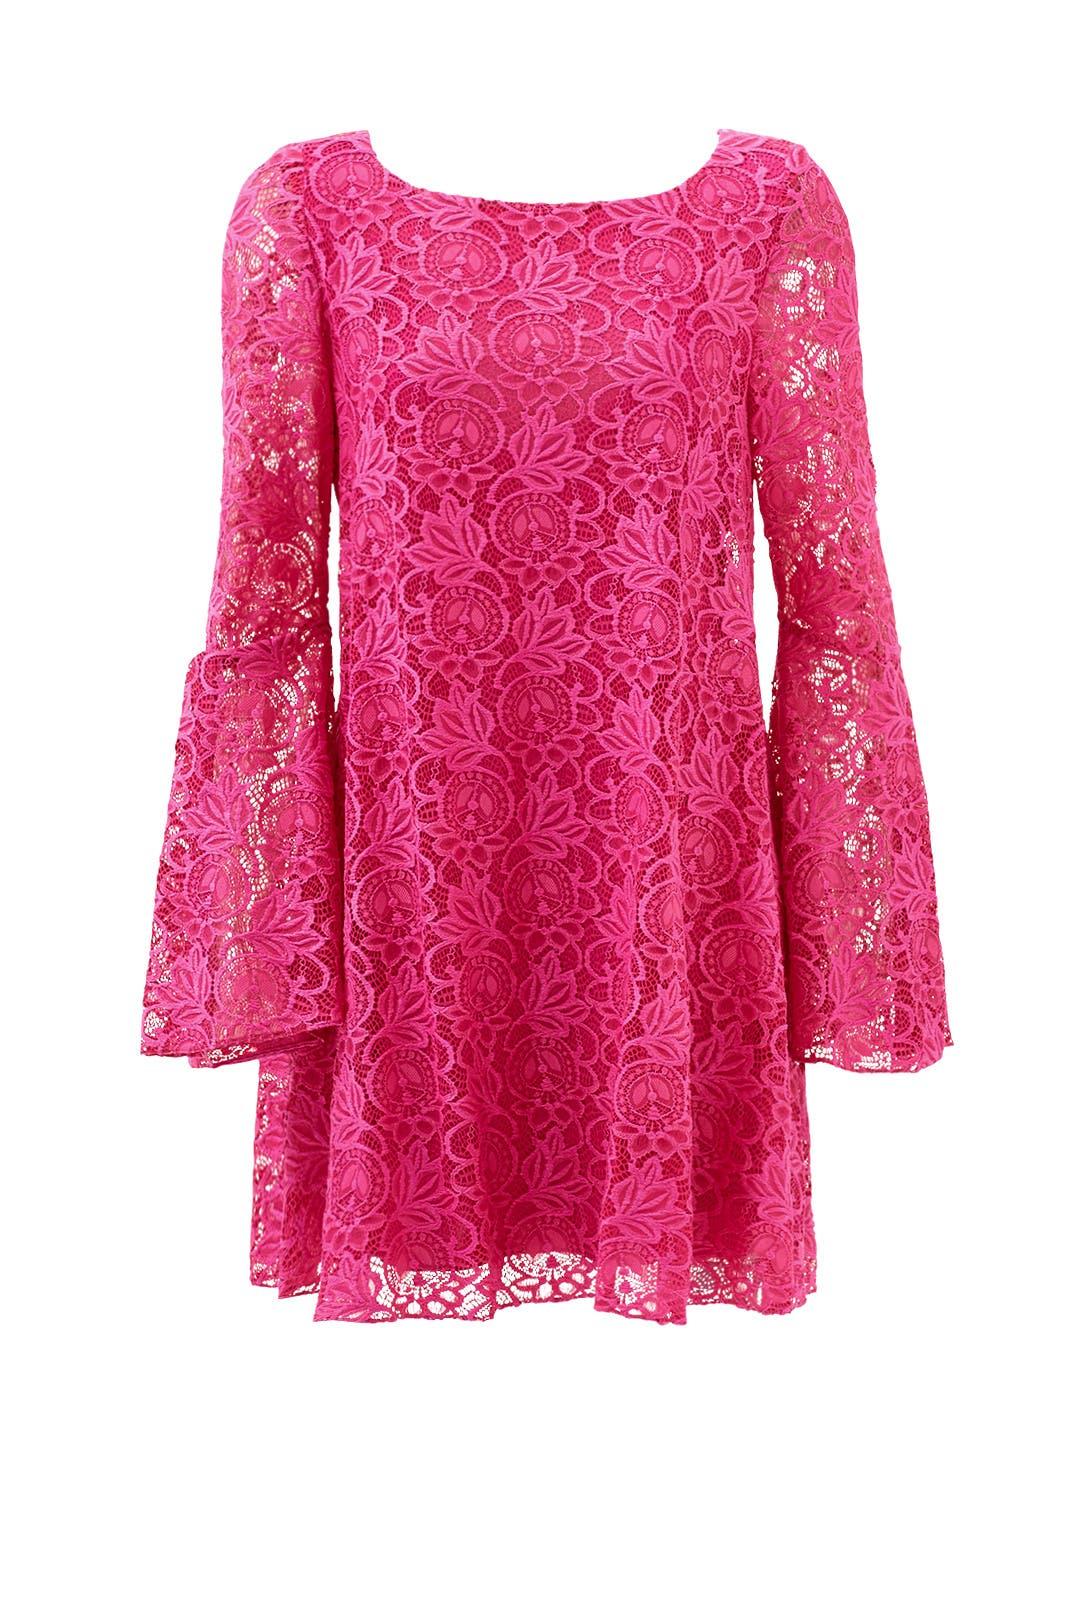 Rental Badgley Mischka Fuchsia Lace Bell Sleeve Shift 50 liked